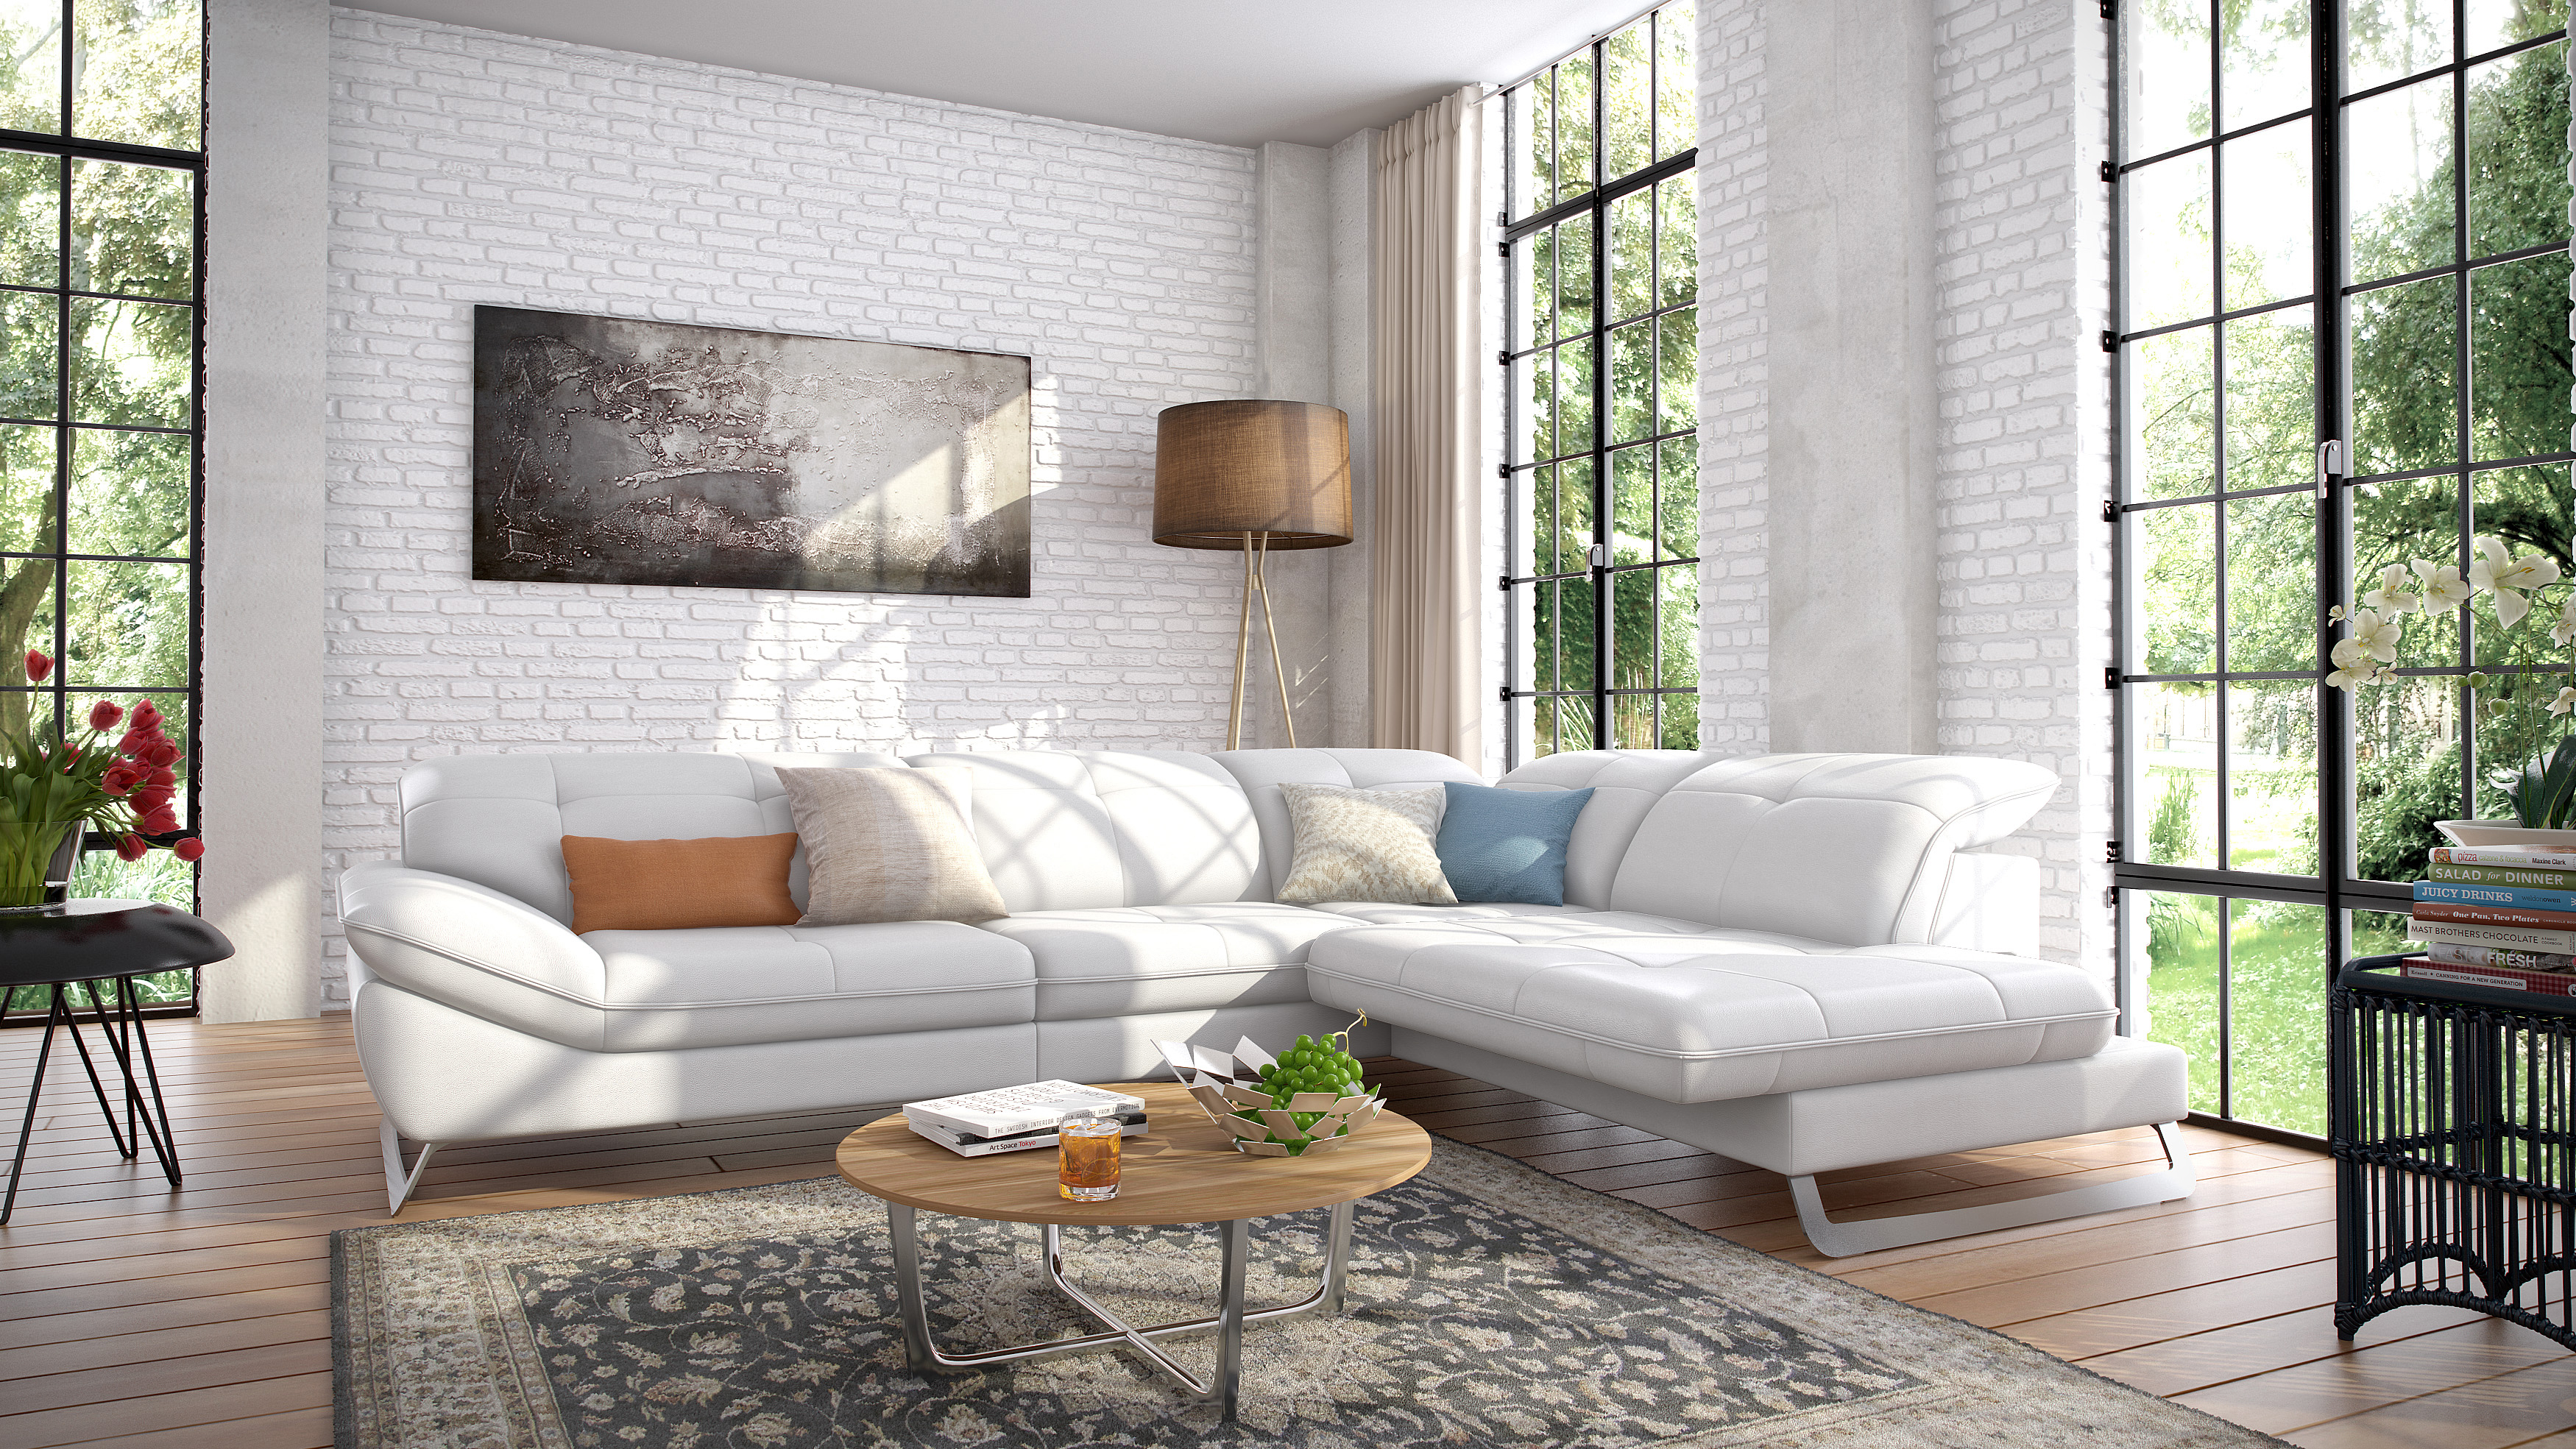 Modello – Modello meubles Bien chez soi